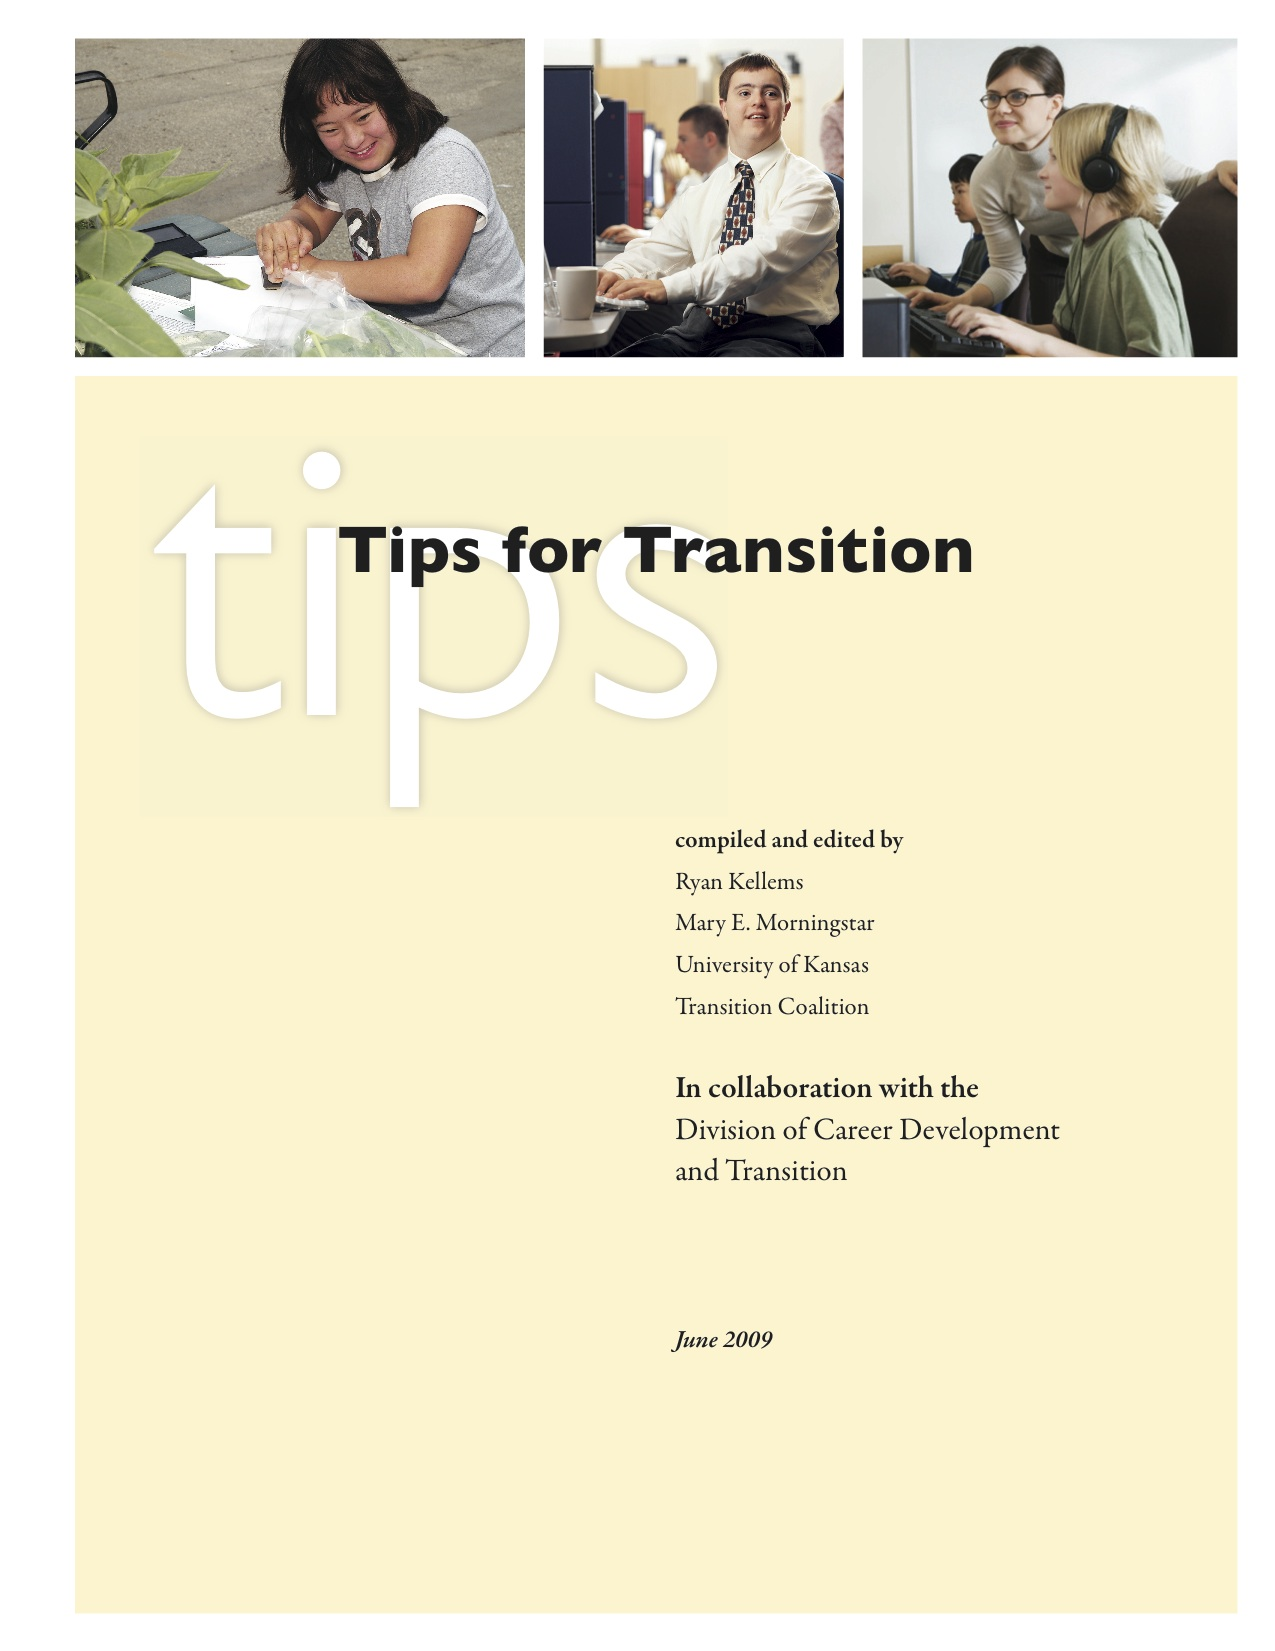 Tips_Sep09_final.jpg